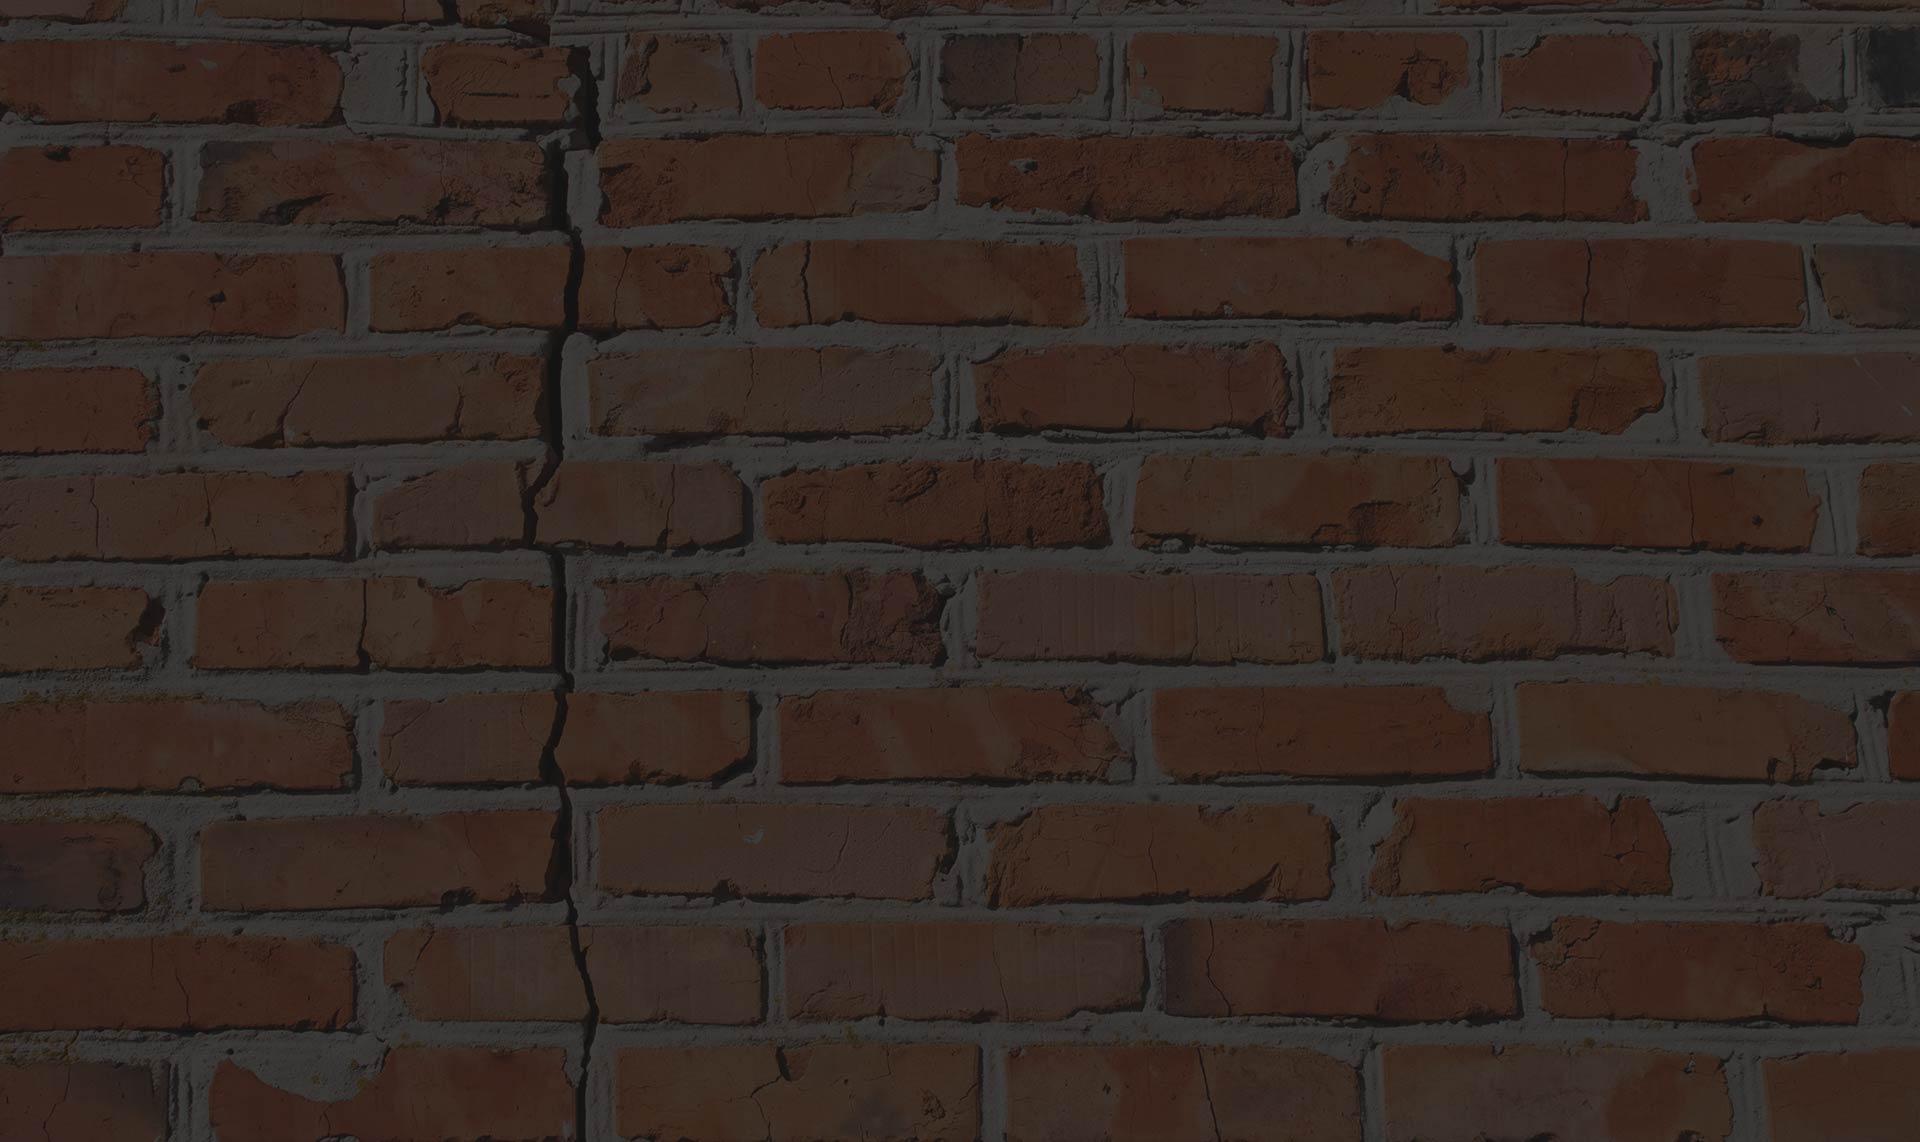 cracked brick wall image